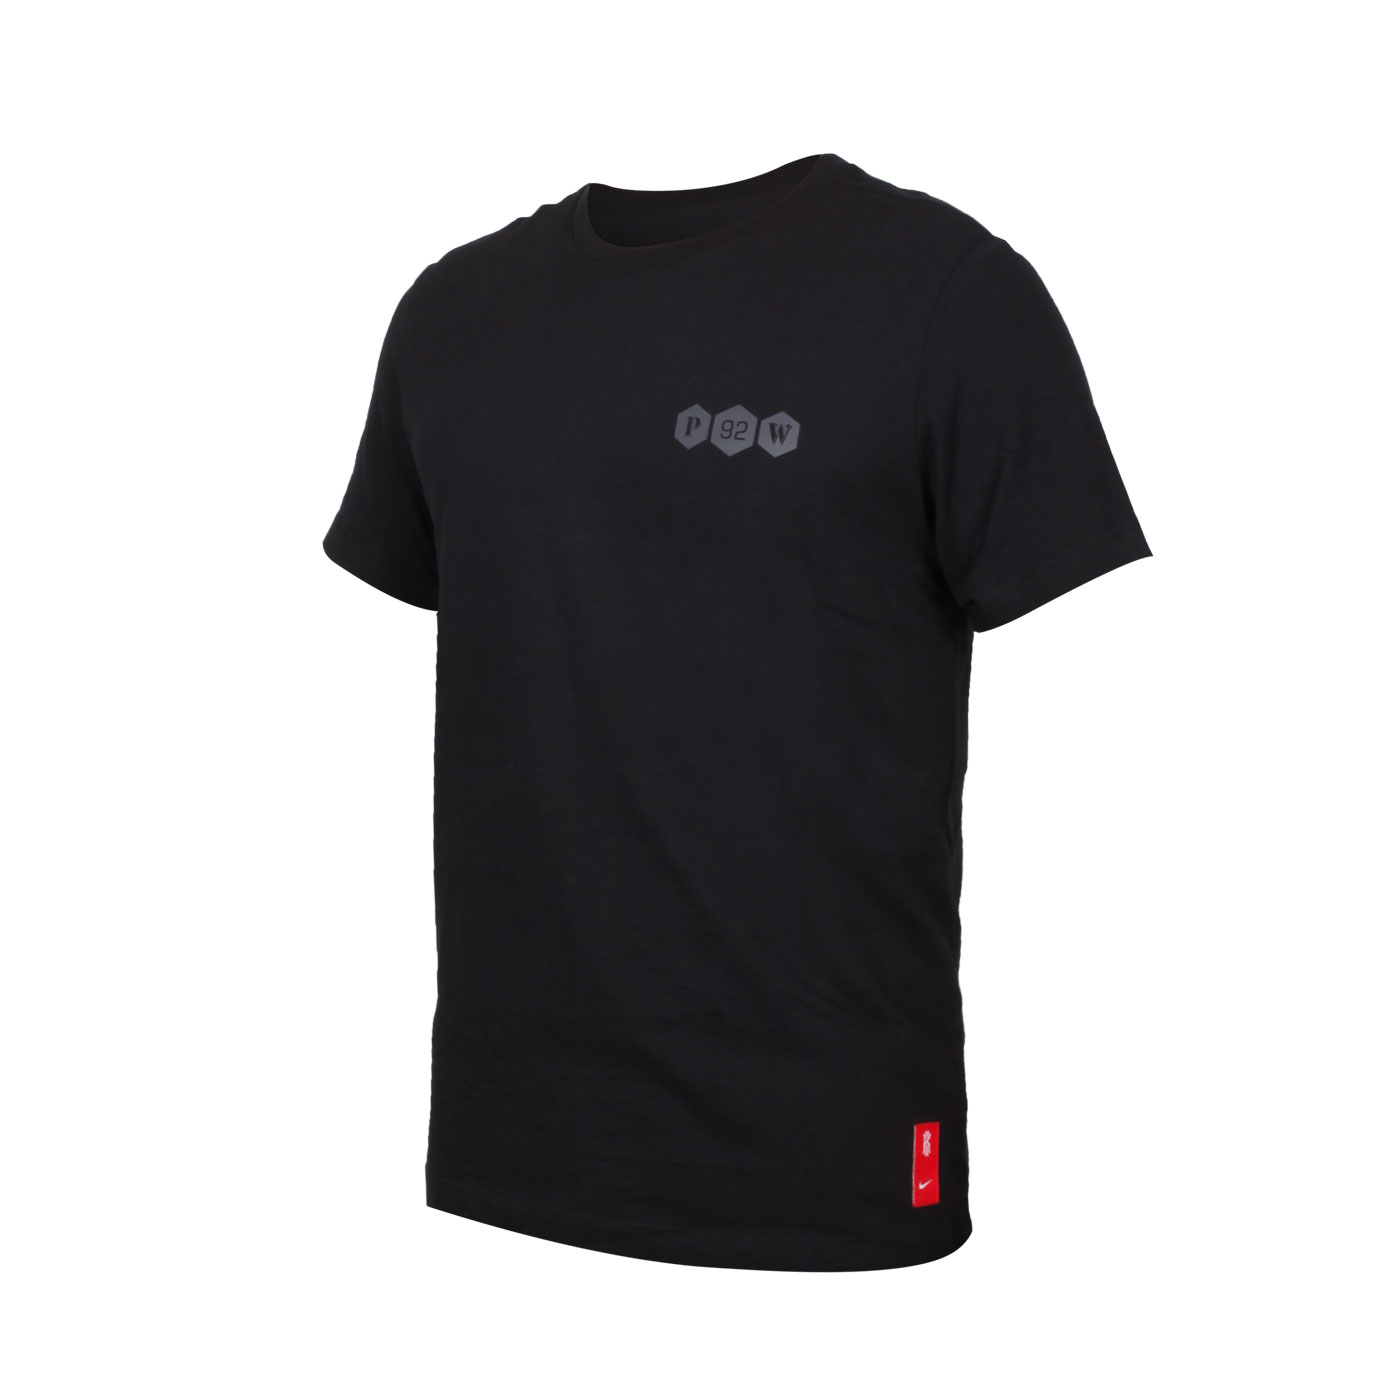 NIKE 男款短袖T恤 CV2061-010 - 黑灰